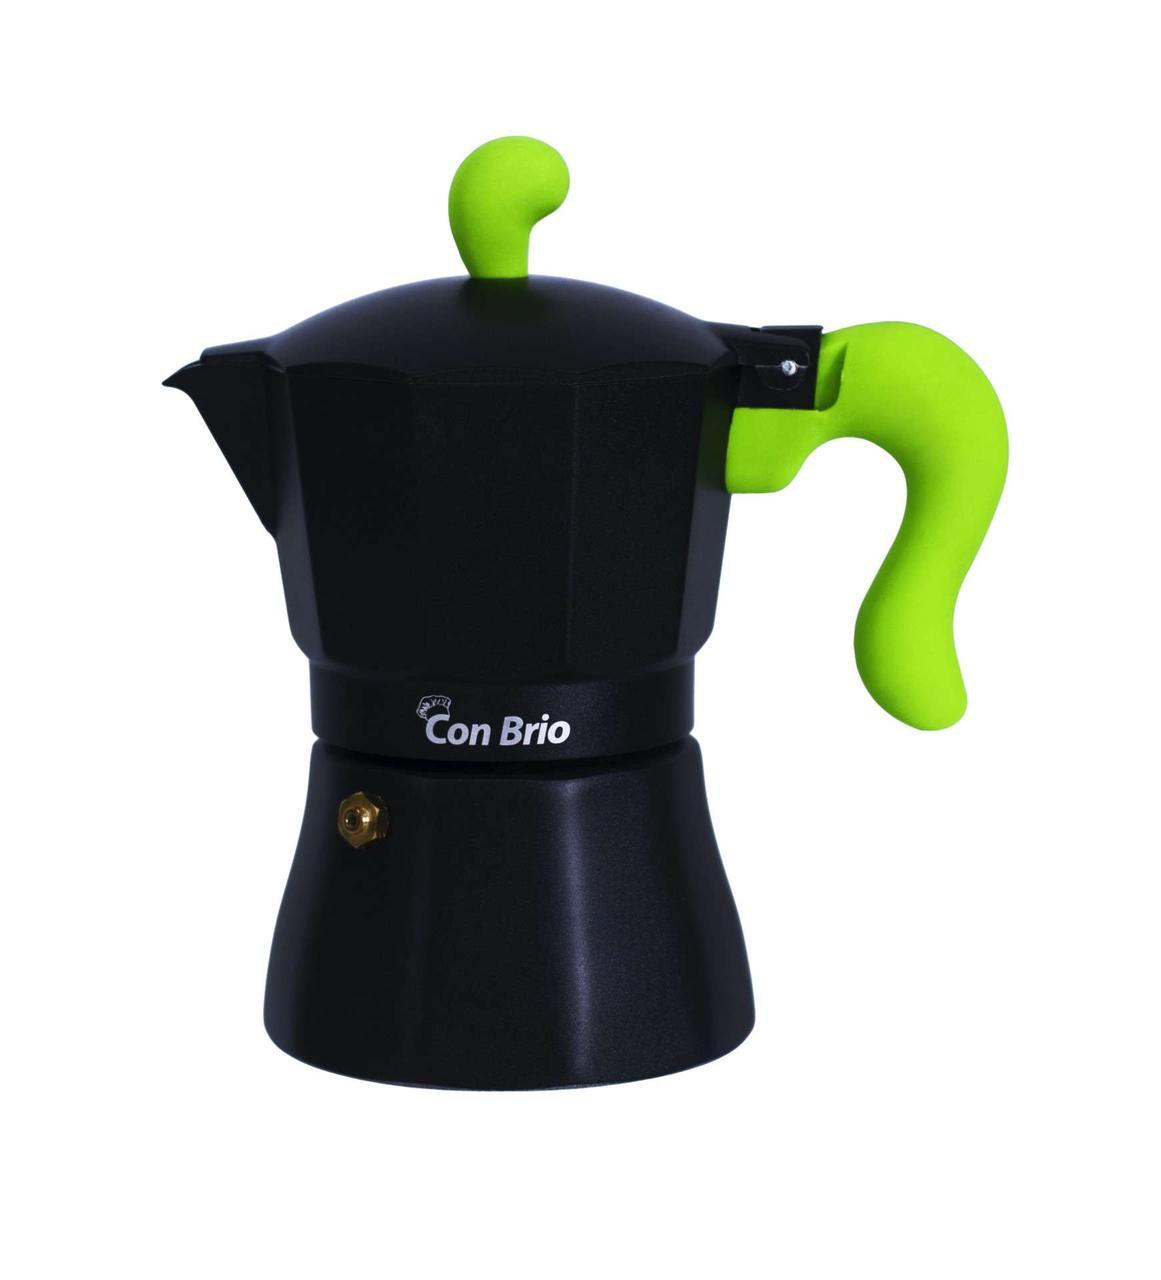 Гейзерная кофеварка Con Brio CB-6606 на 6 чашек | турка Con Brio зелёная